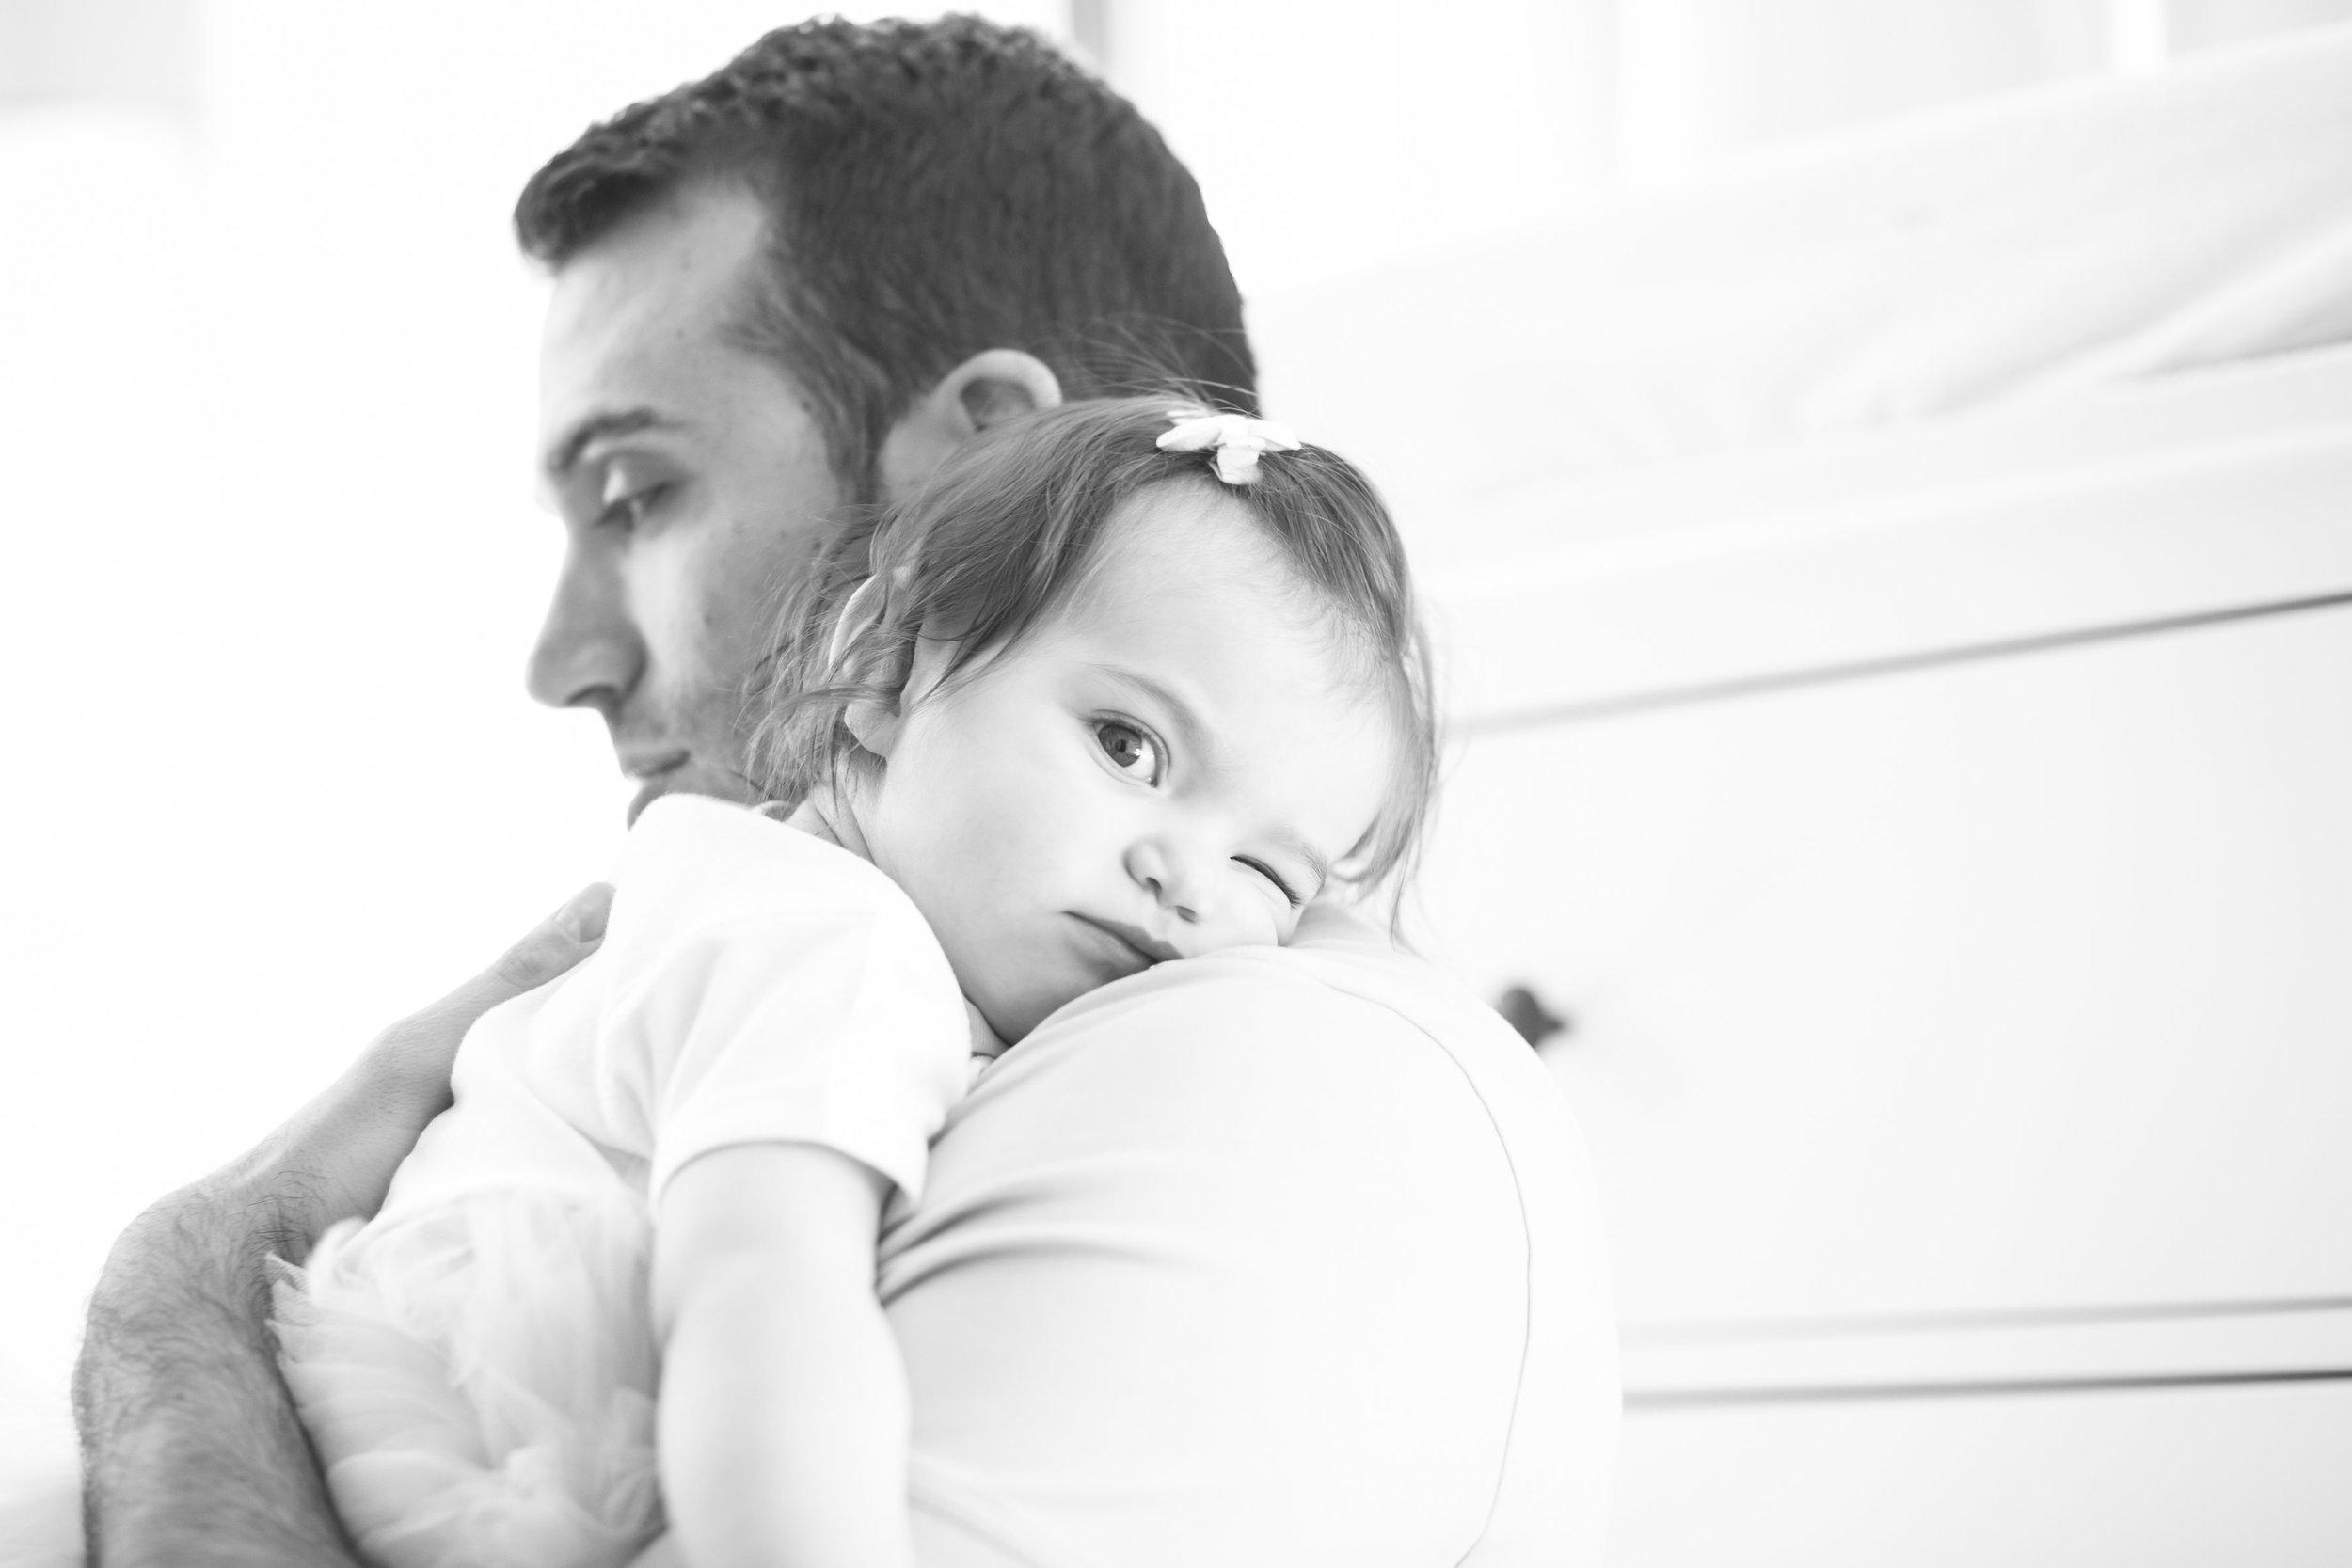 JJ-Ignotz-NYC-Photographer-babies_014.JPG